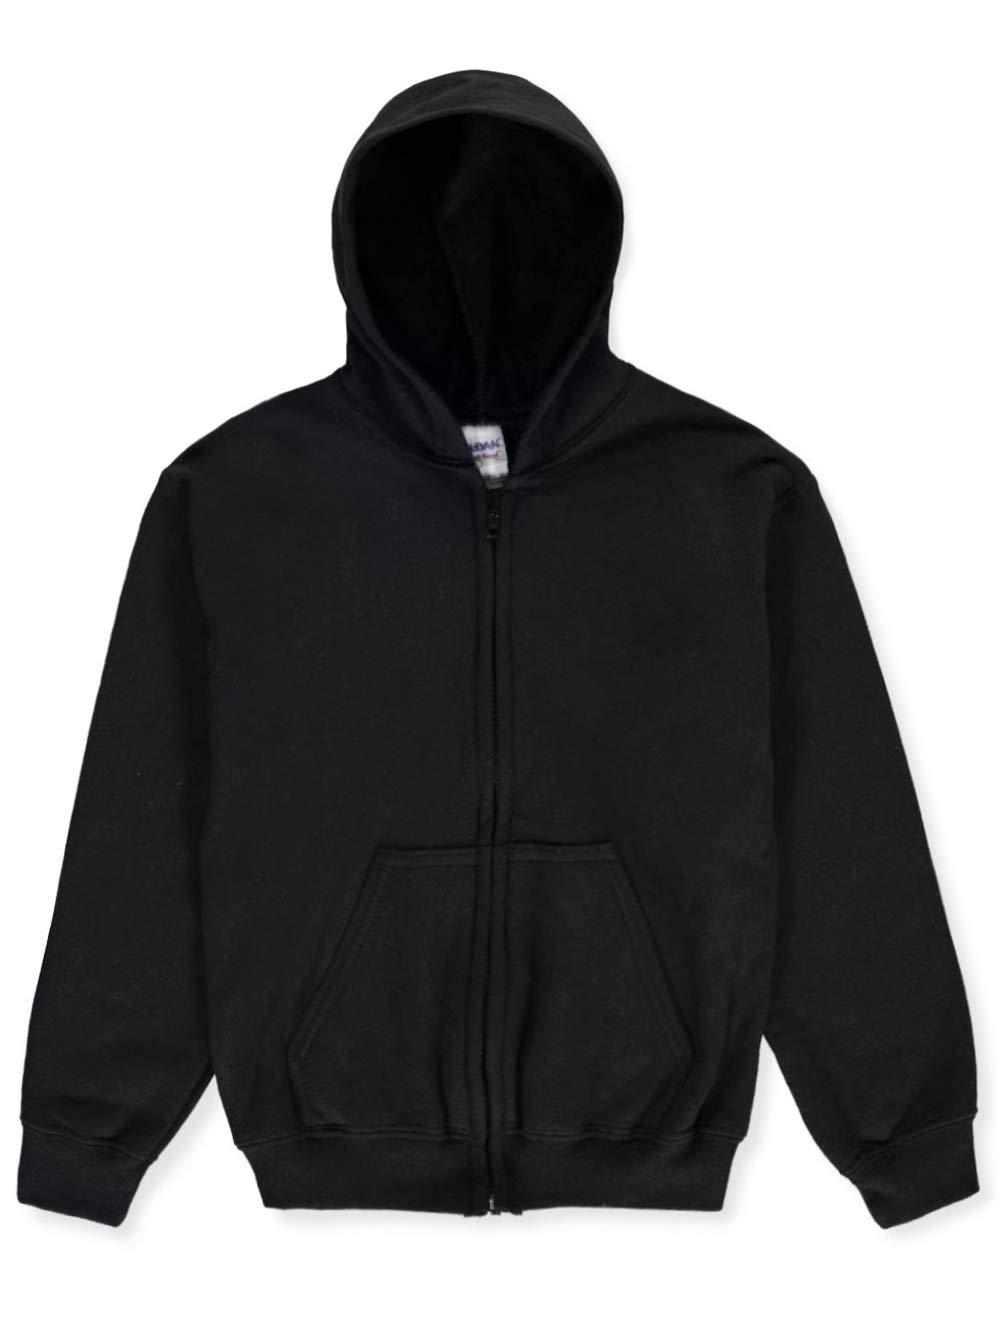 Gildan Basic Fleece Zip-Up Unisex Hoodie